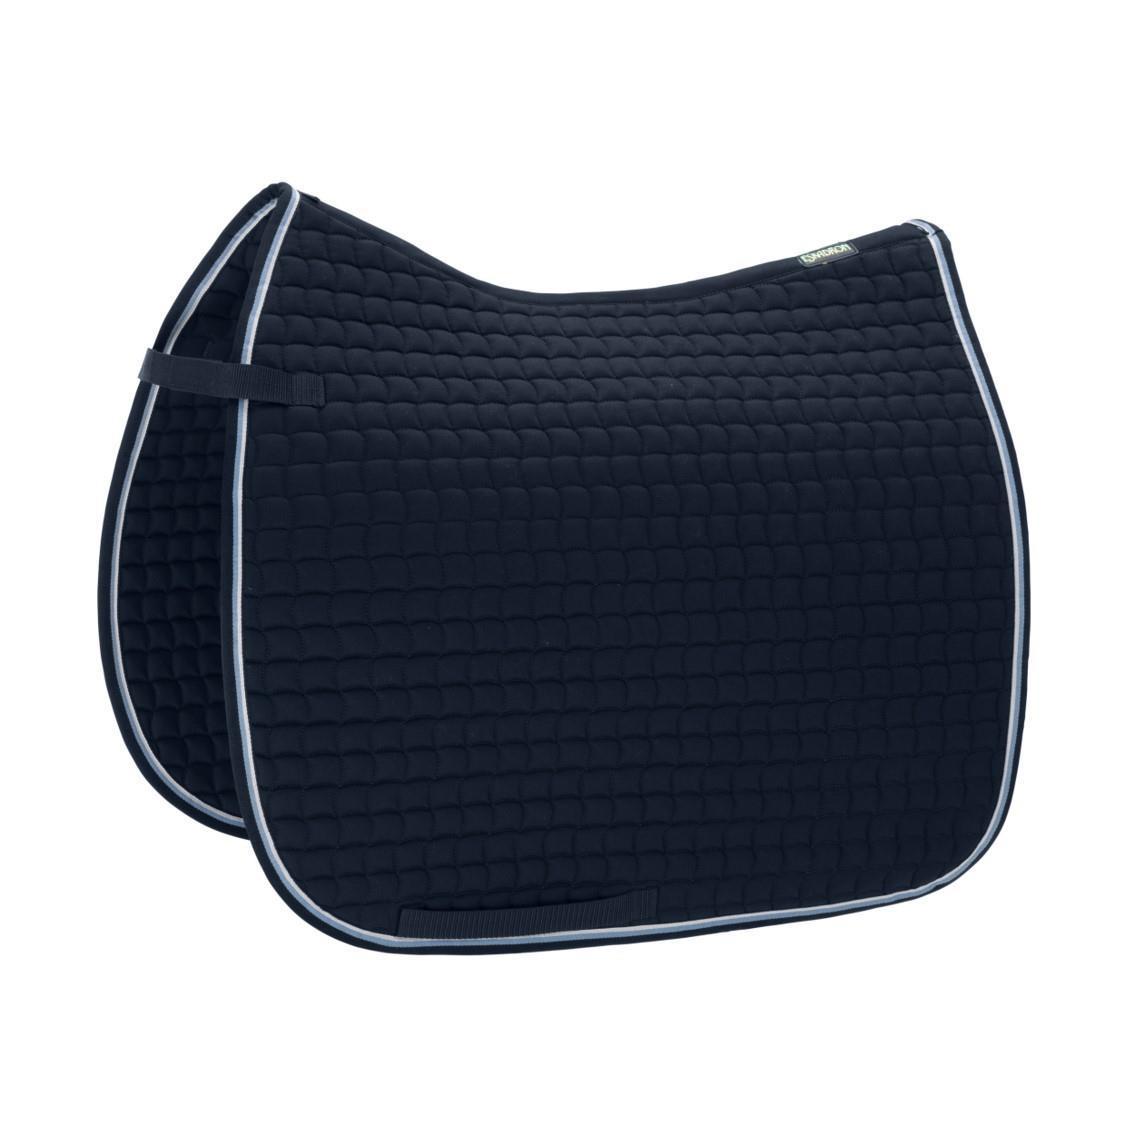 Eskadron Basics Cotton Sport Selection Dressage Saddle Pad